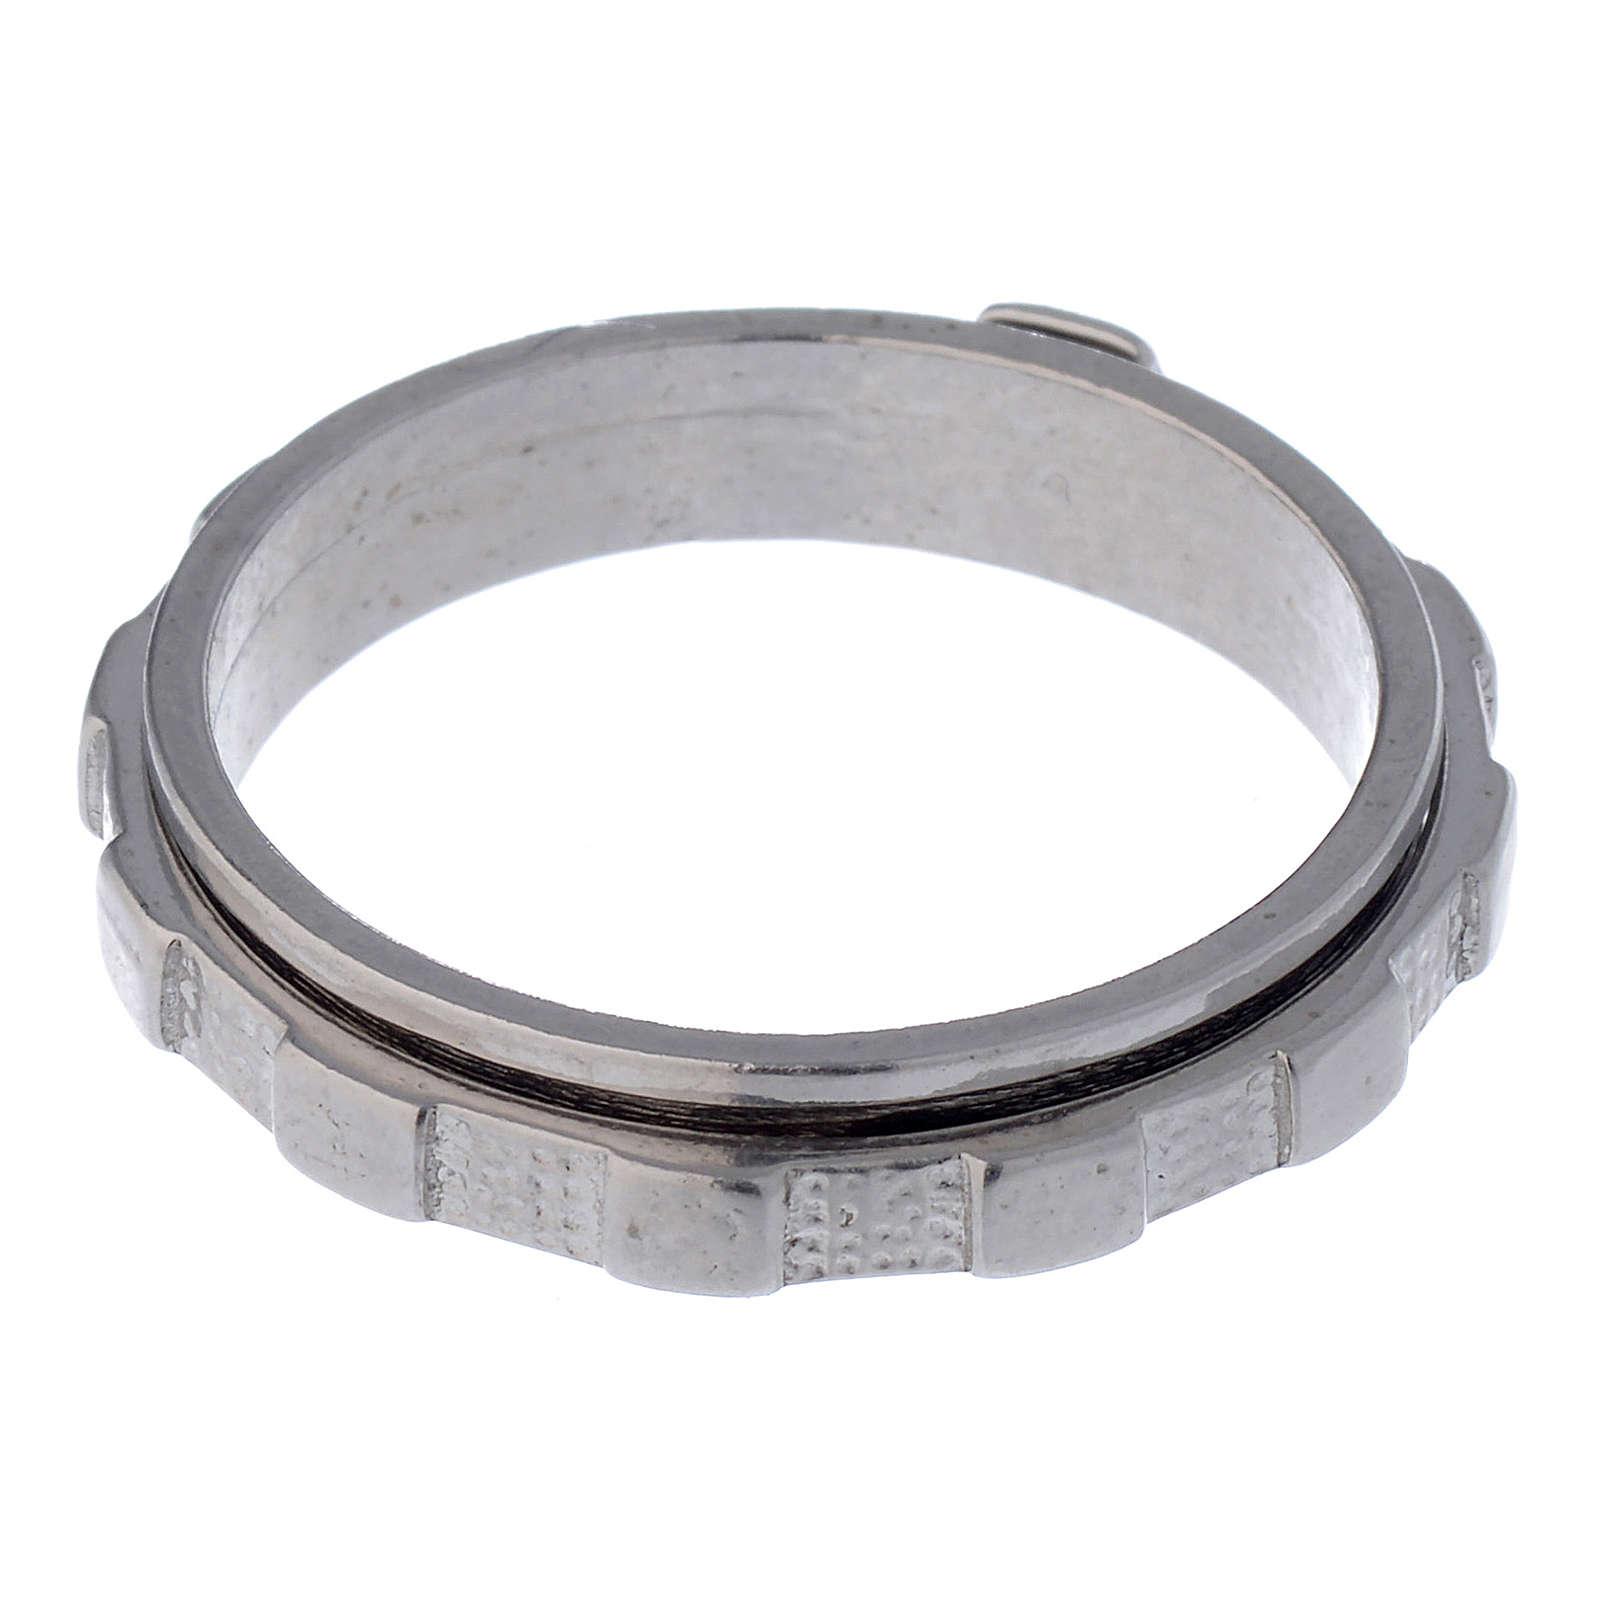 Rosenkranz Ring Silber 925 drehbar 3